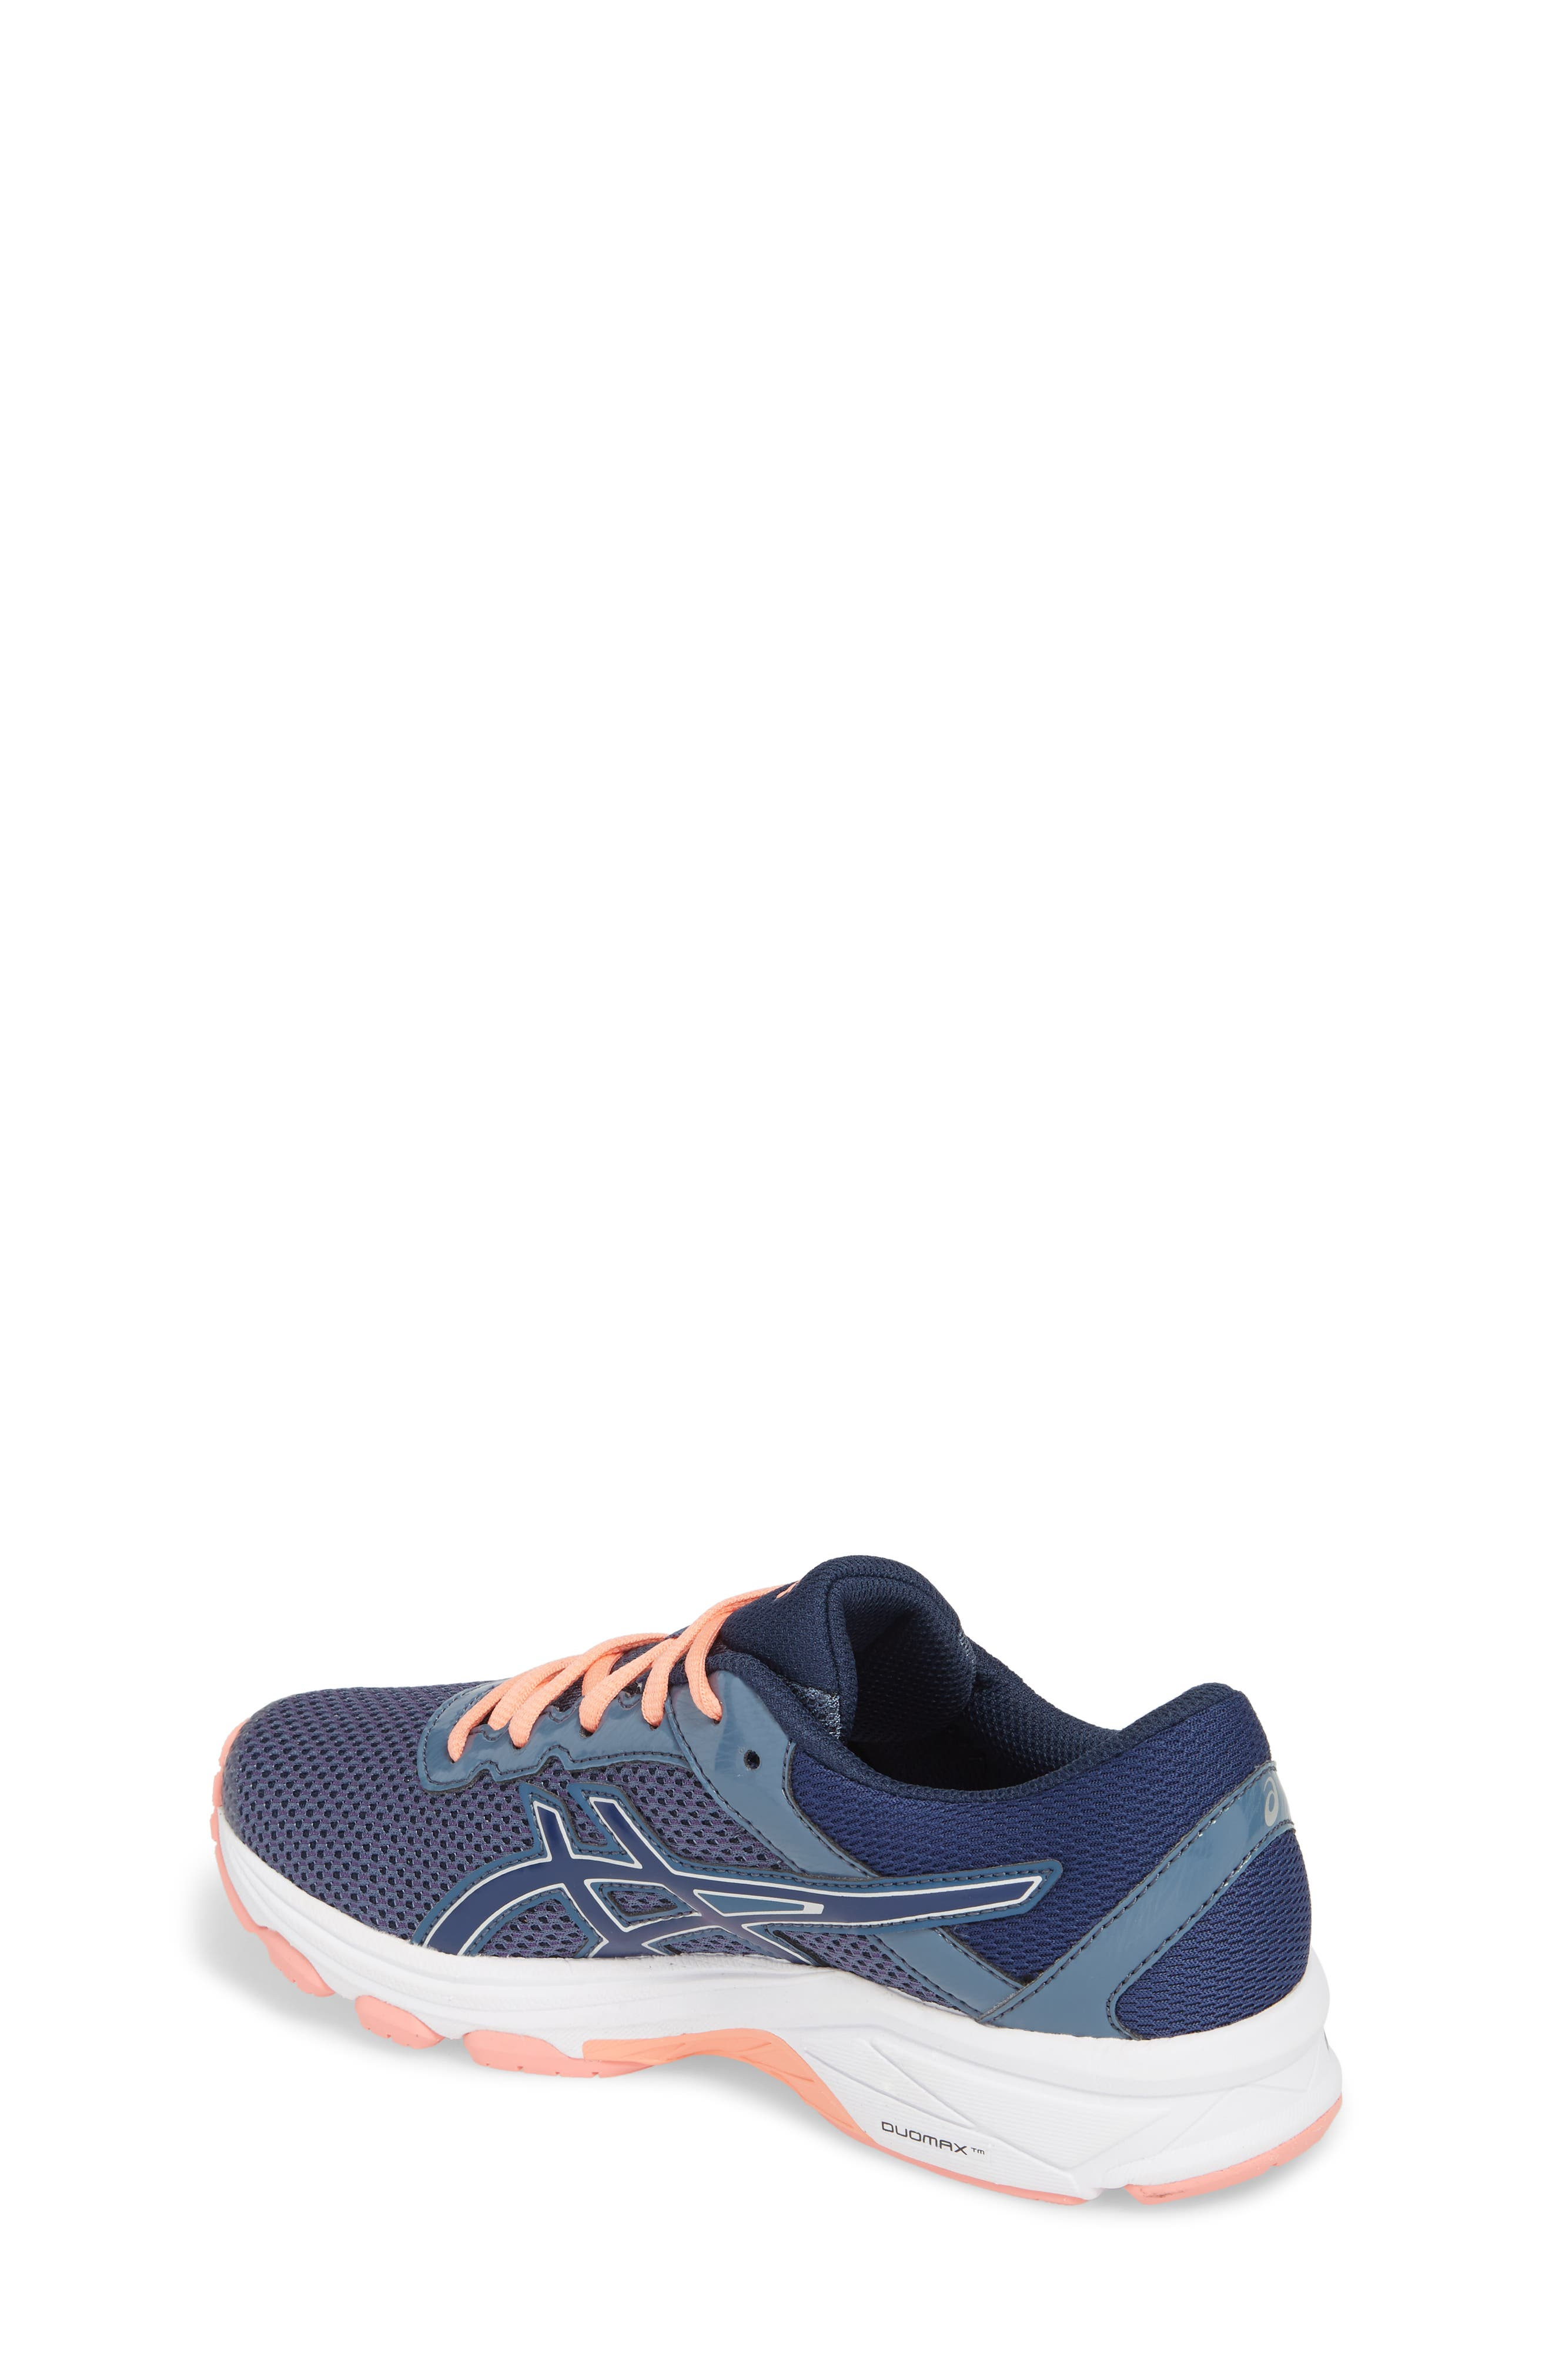 Asics GT-1000<sup>™</sup> 6 GS Sneaker,                             Alternate thumbnail 8, color,